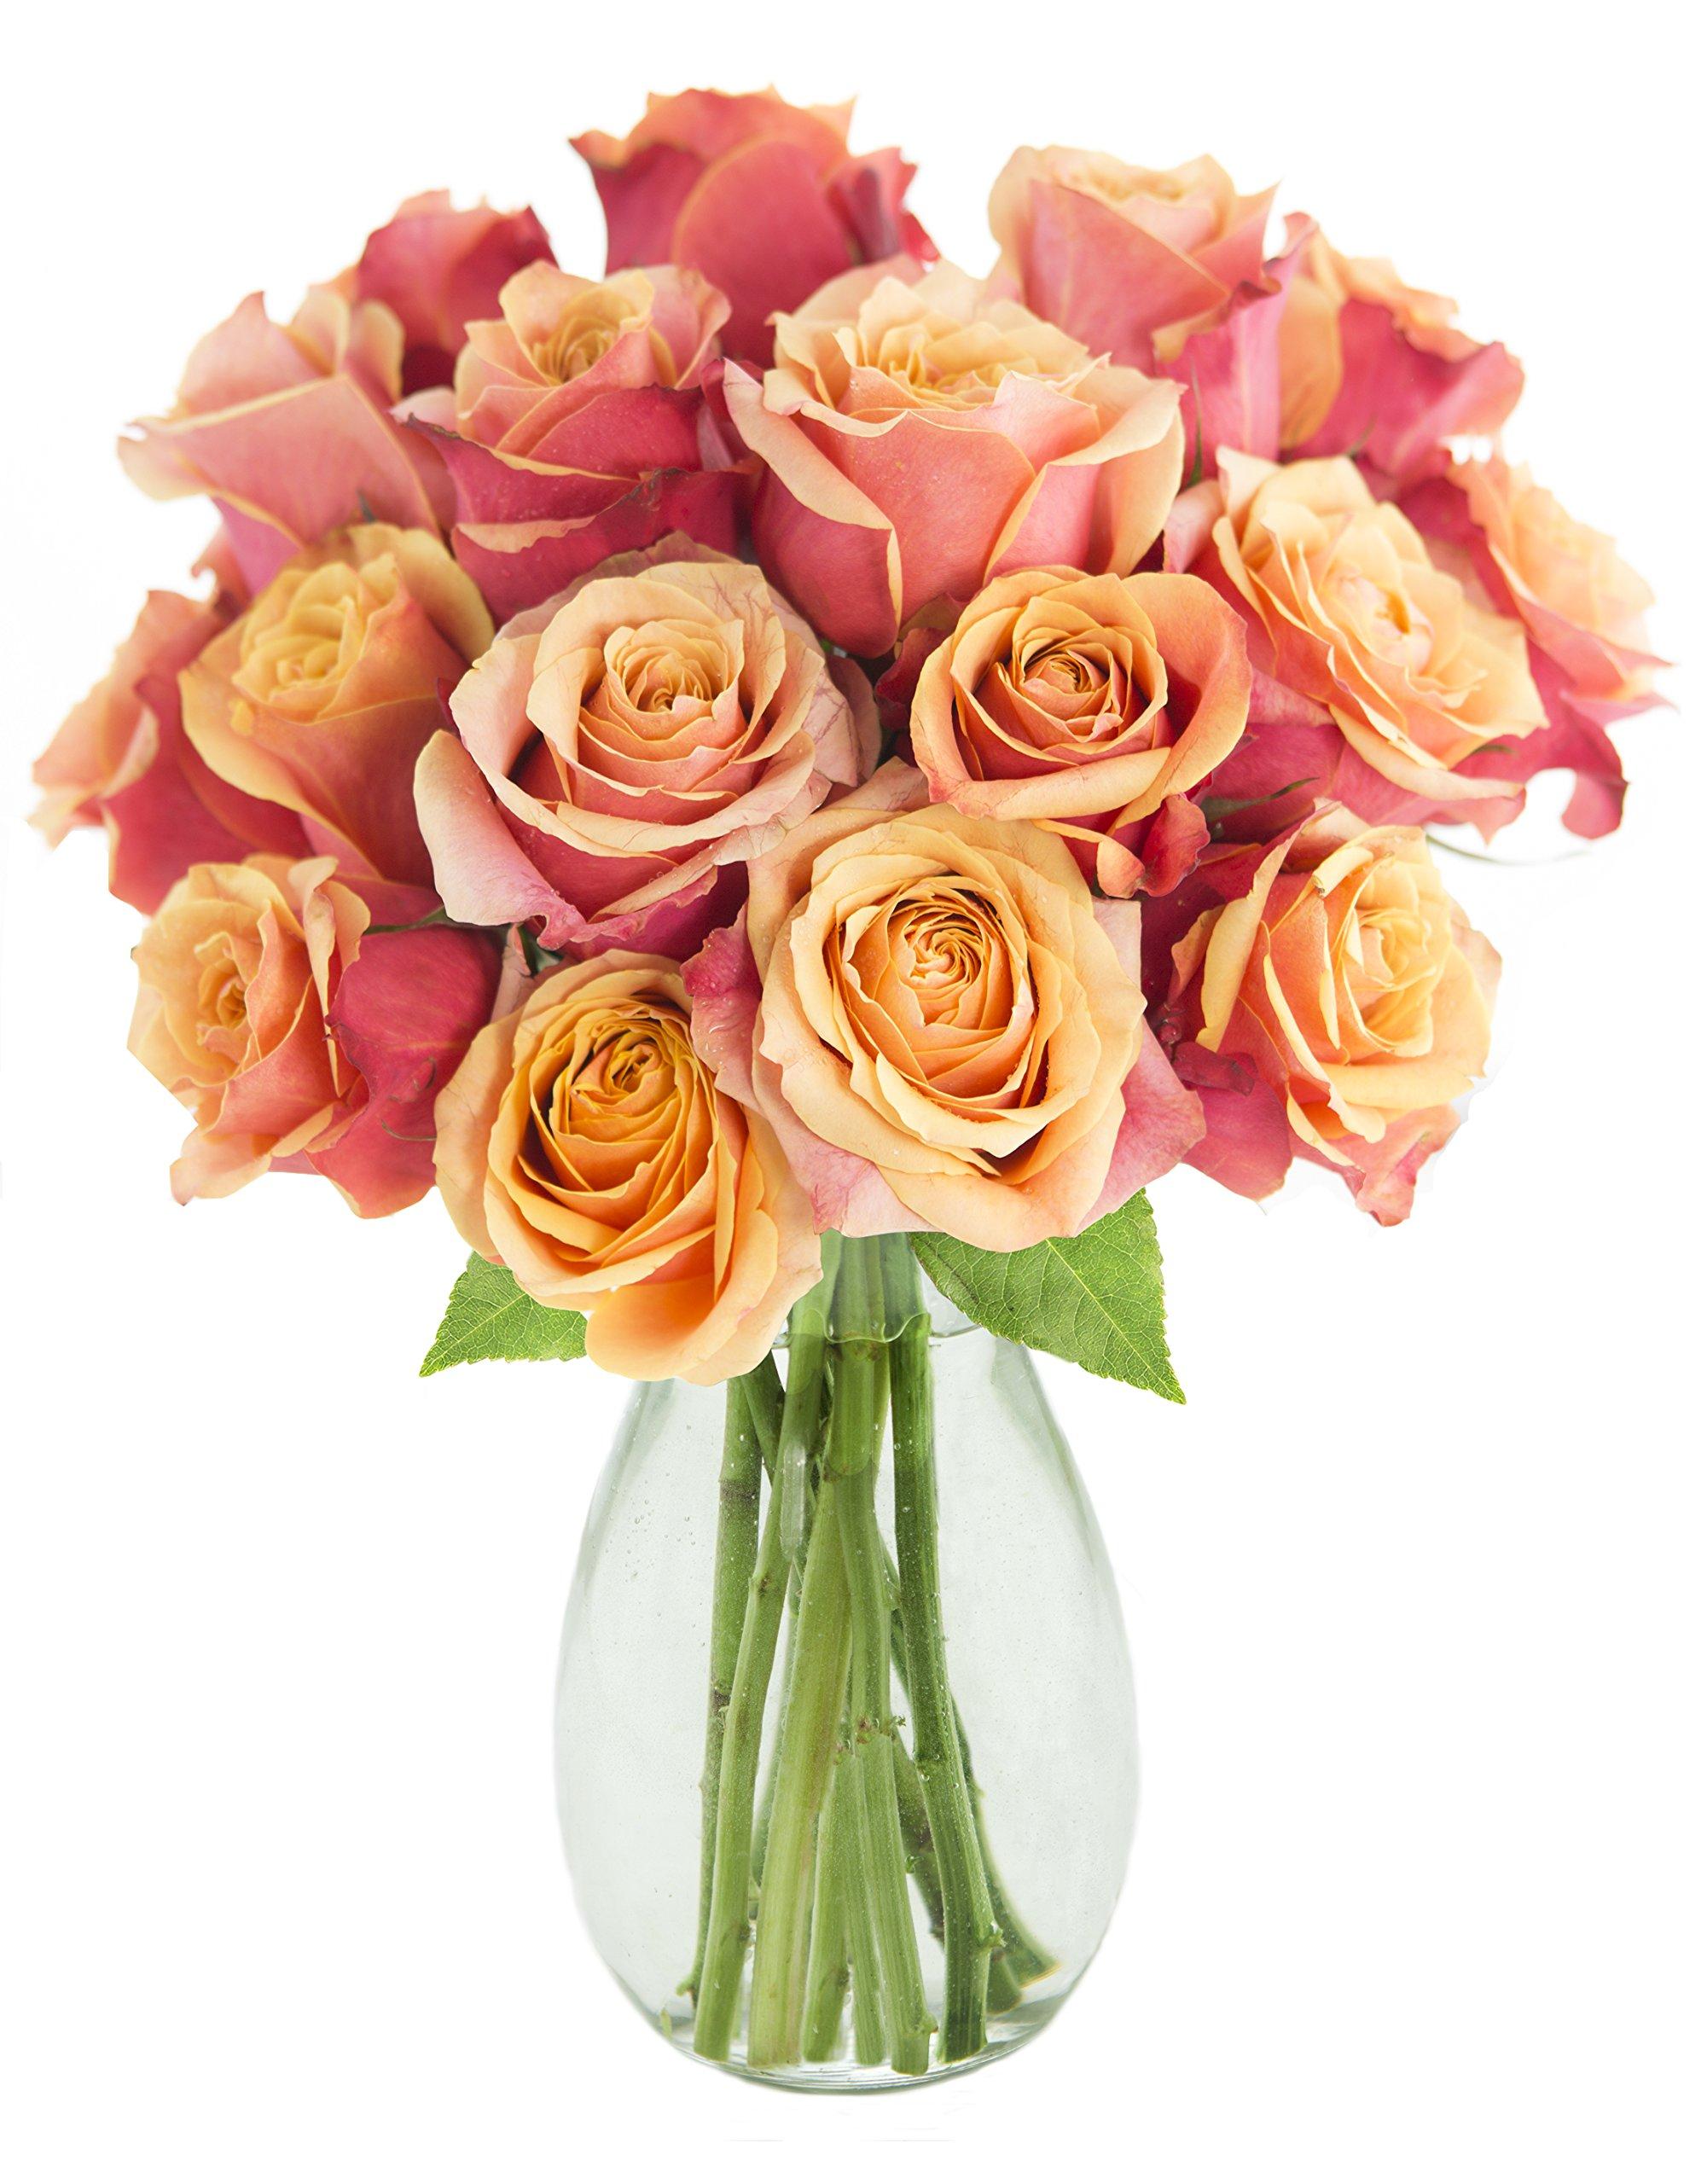 Bouquet of 18 Fresh Cut Orange Roses (Farm-Fresh, Long-Stem) with Free Vase Included